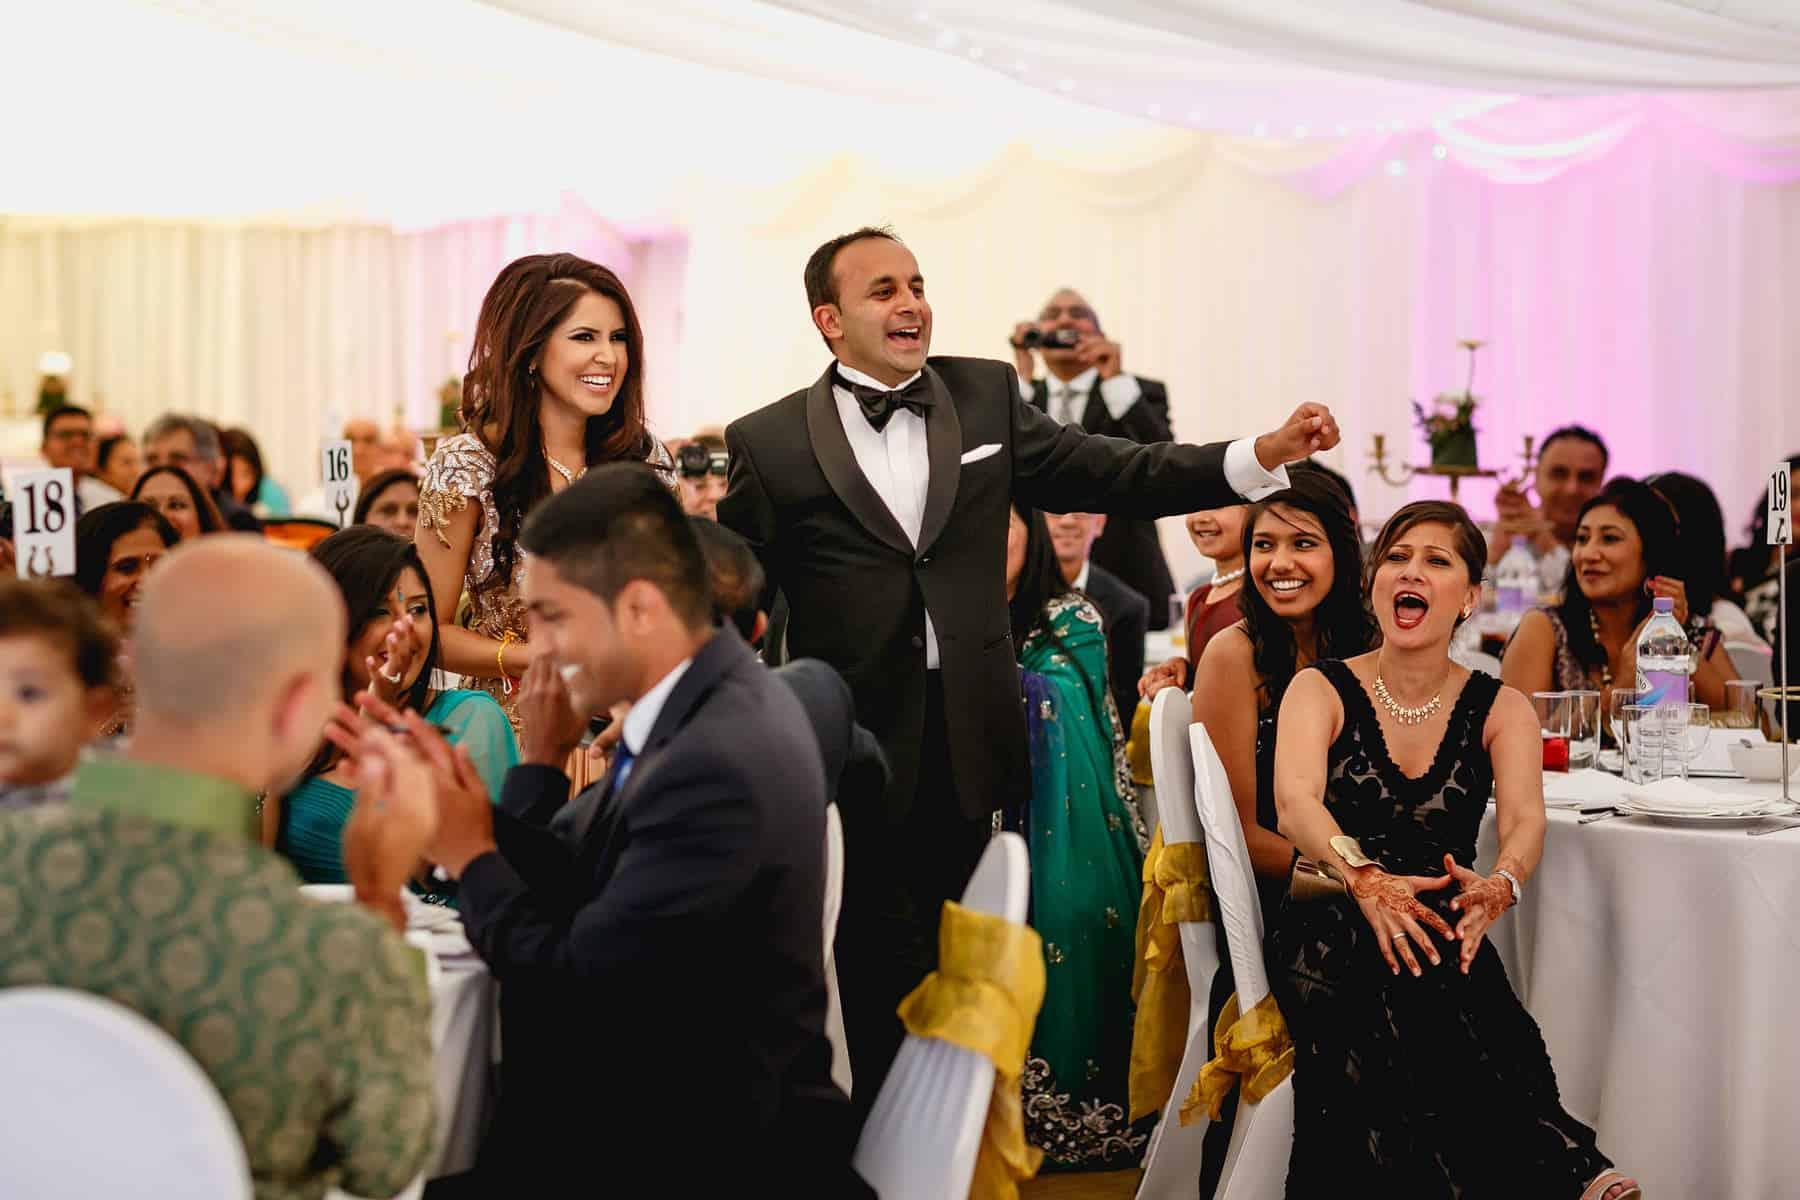 parklands quendon asian wedding